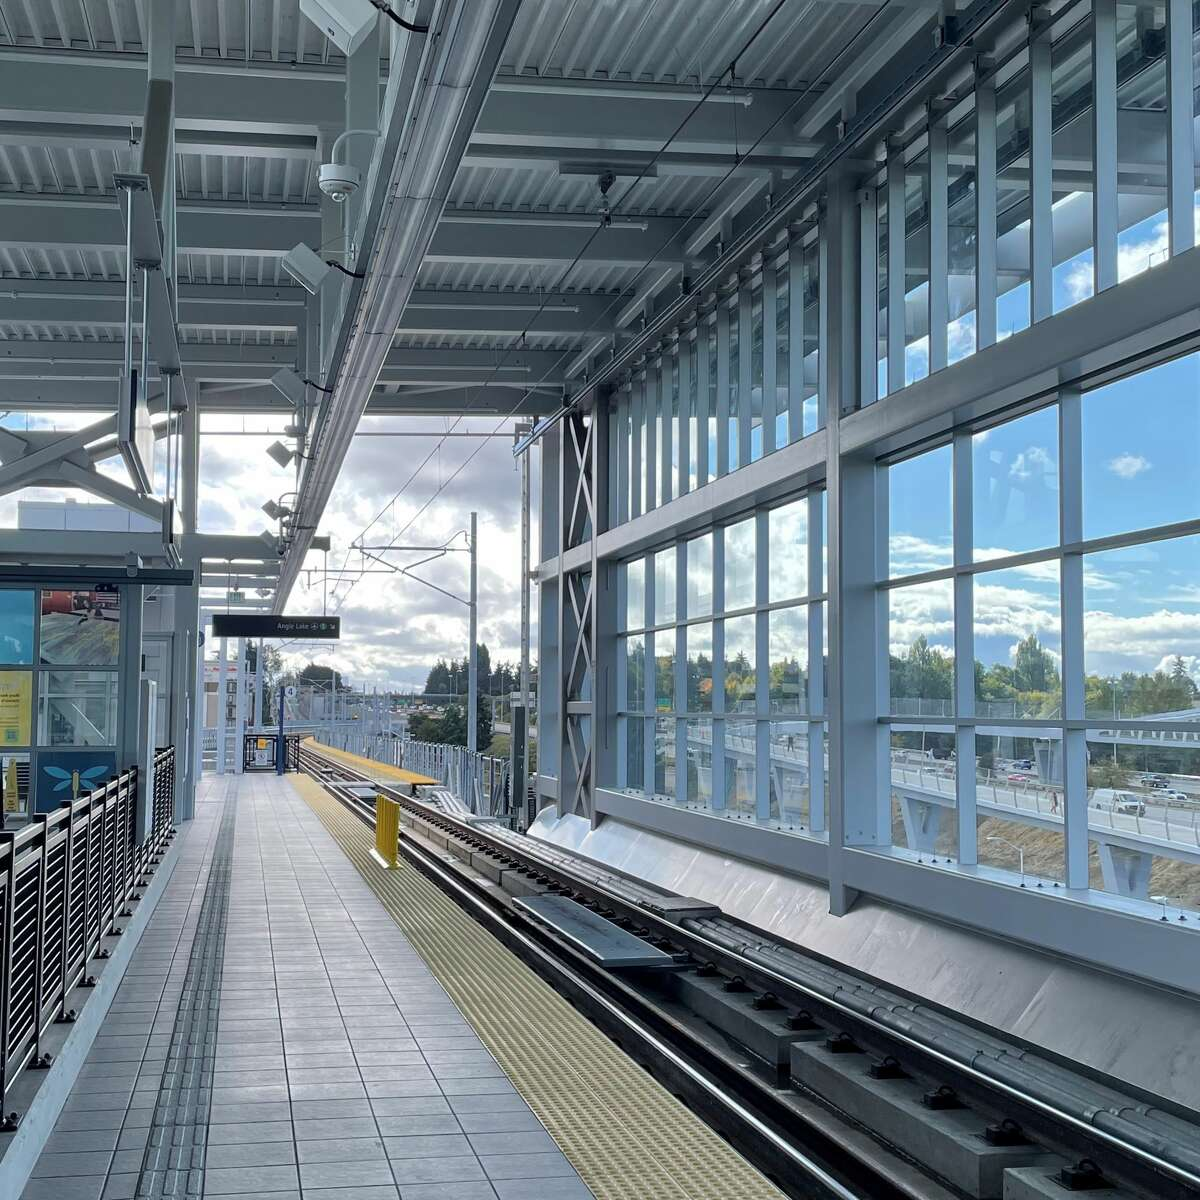 Platform at the new Northgate Station.